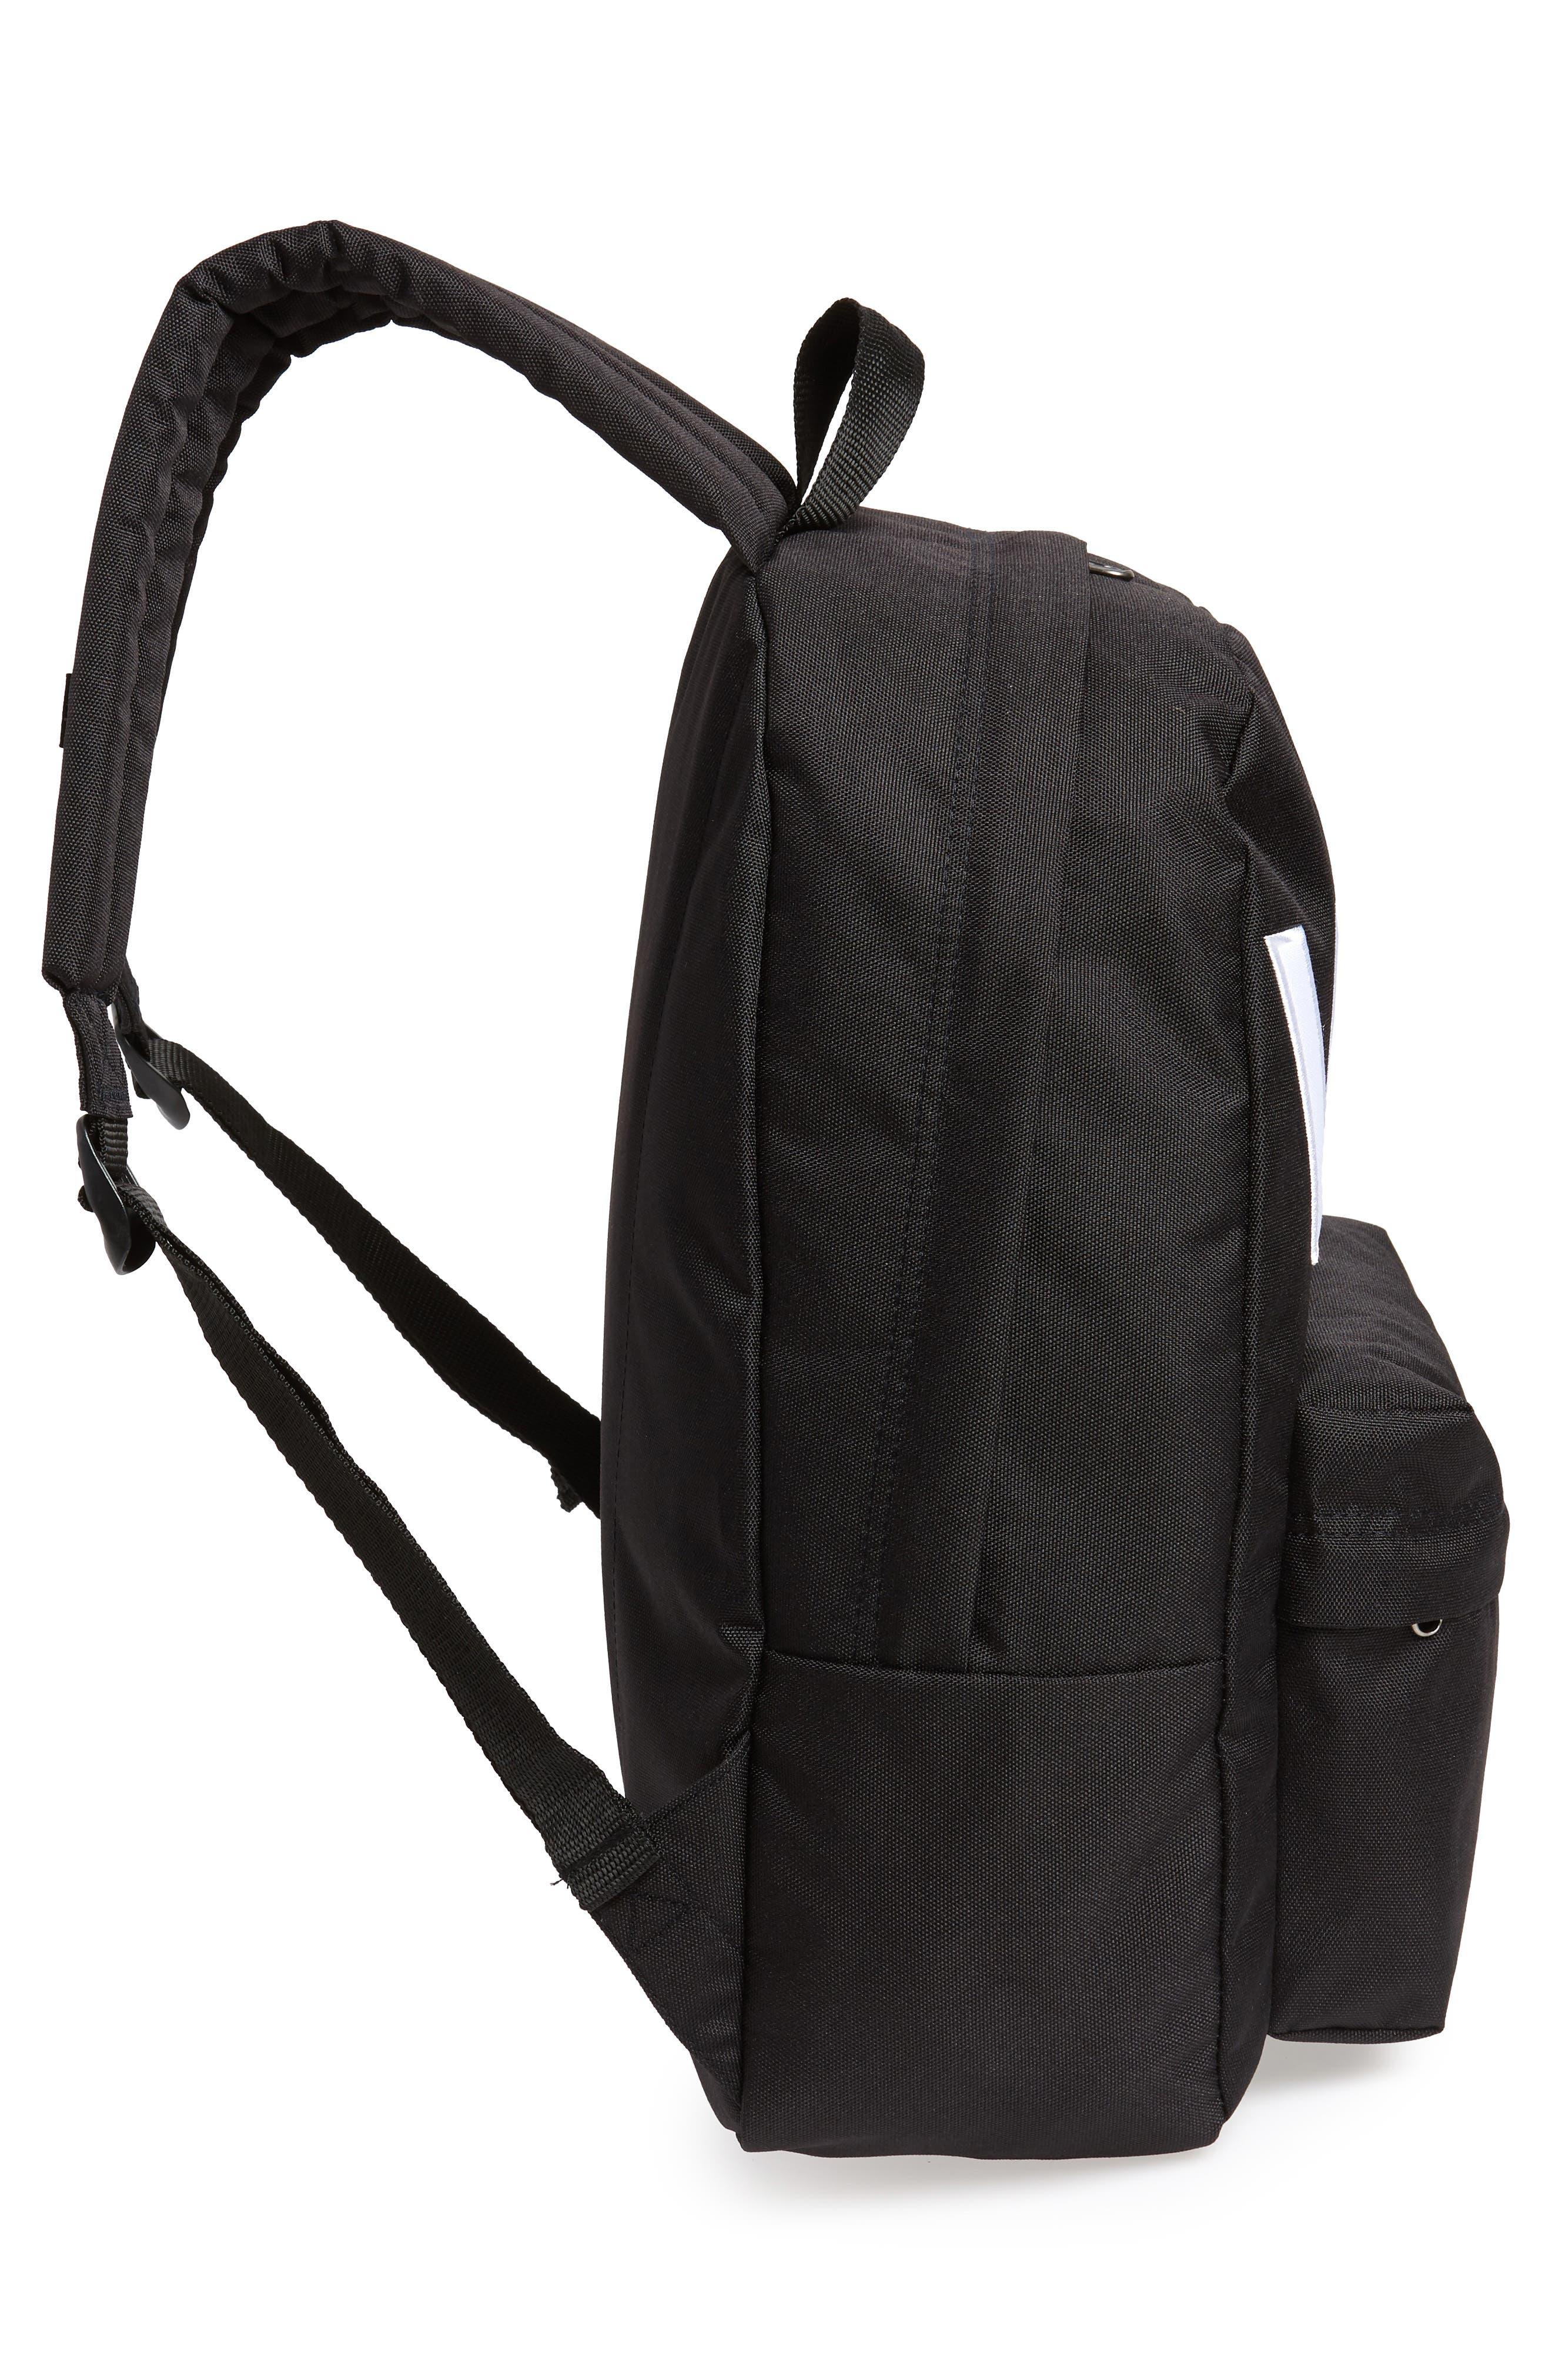 Old Skool II Backpack,                             Alternate thumbnail 5, color,                             Black/ White